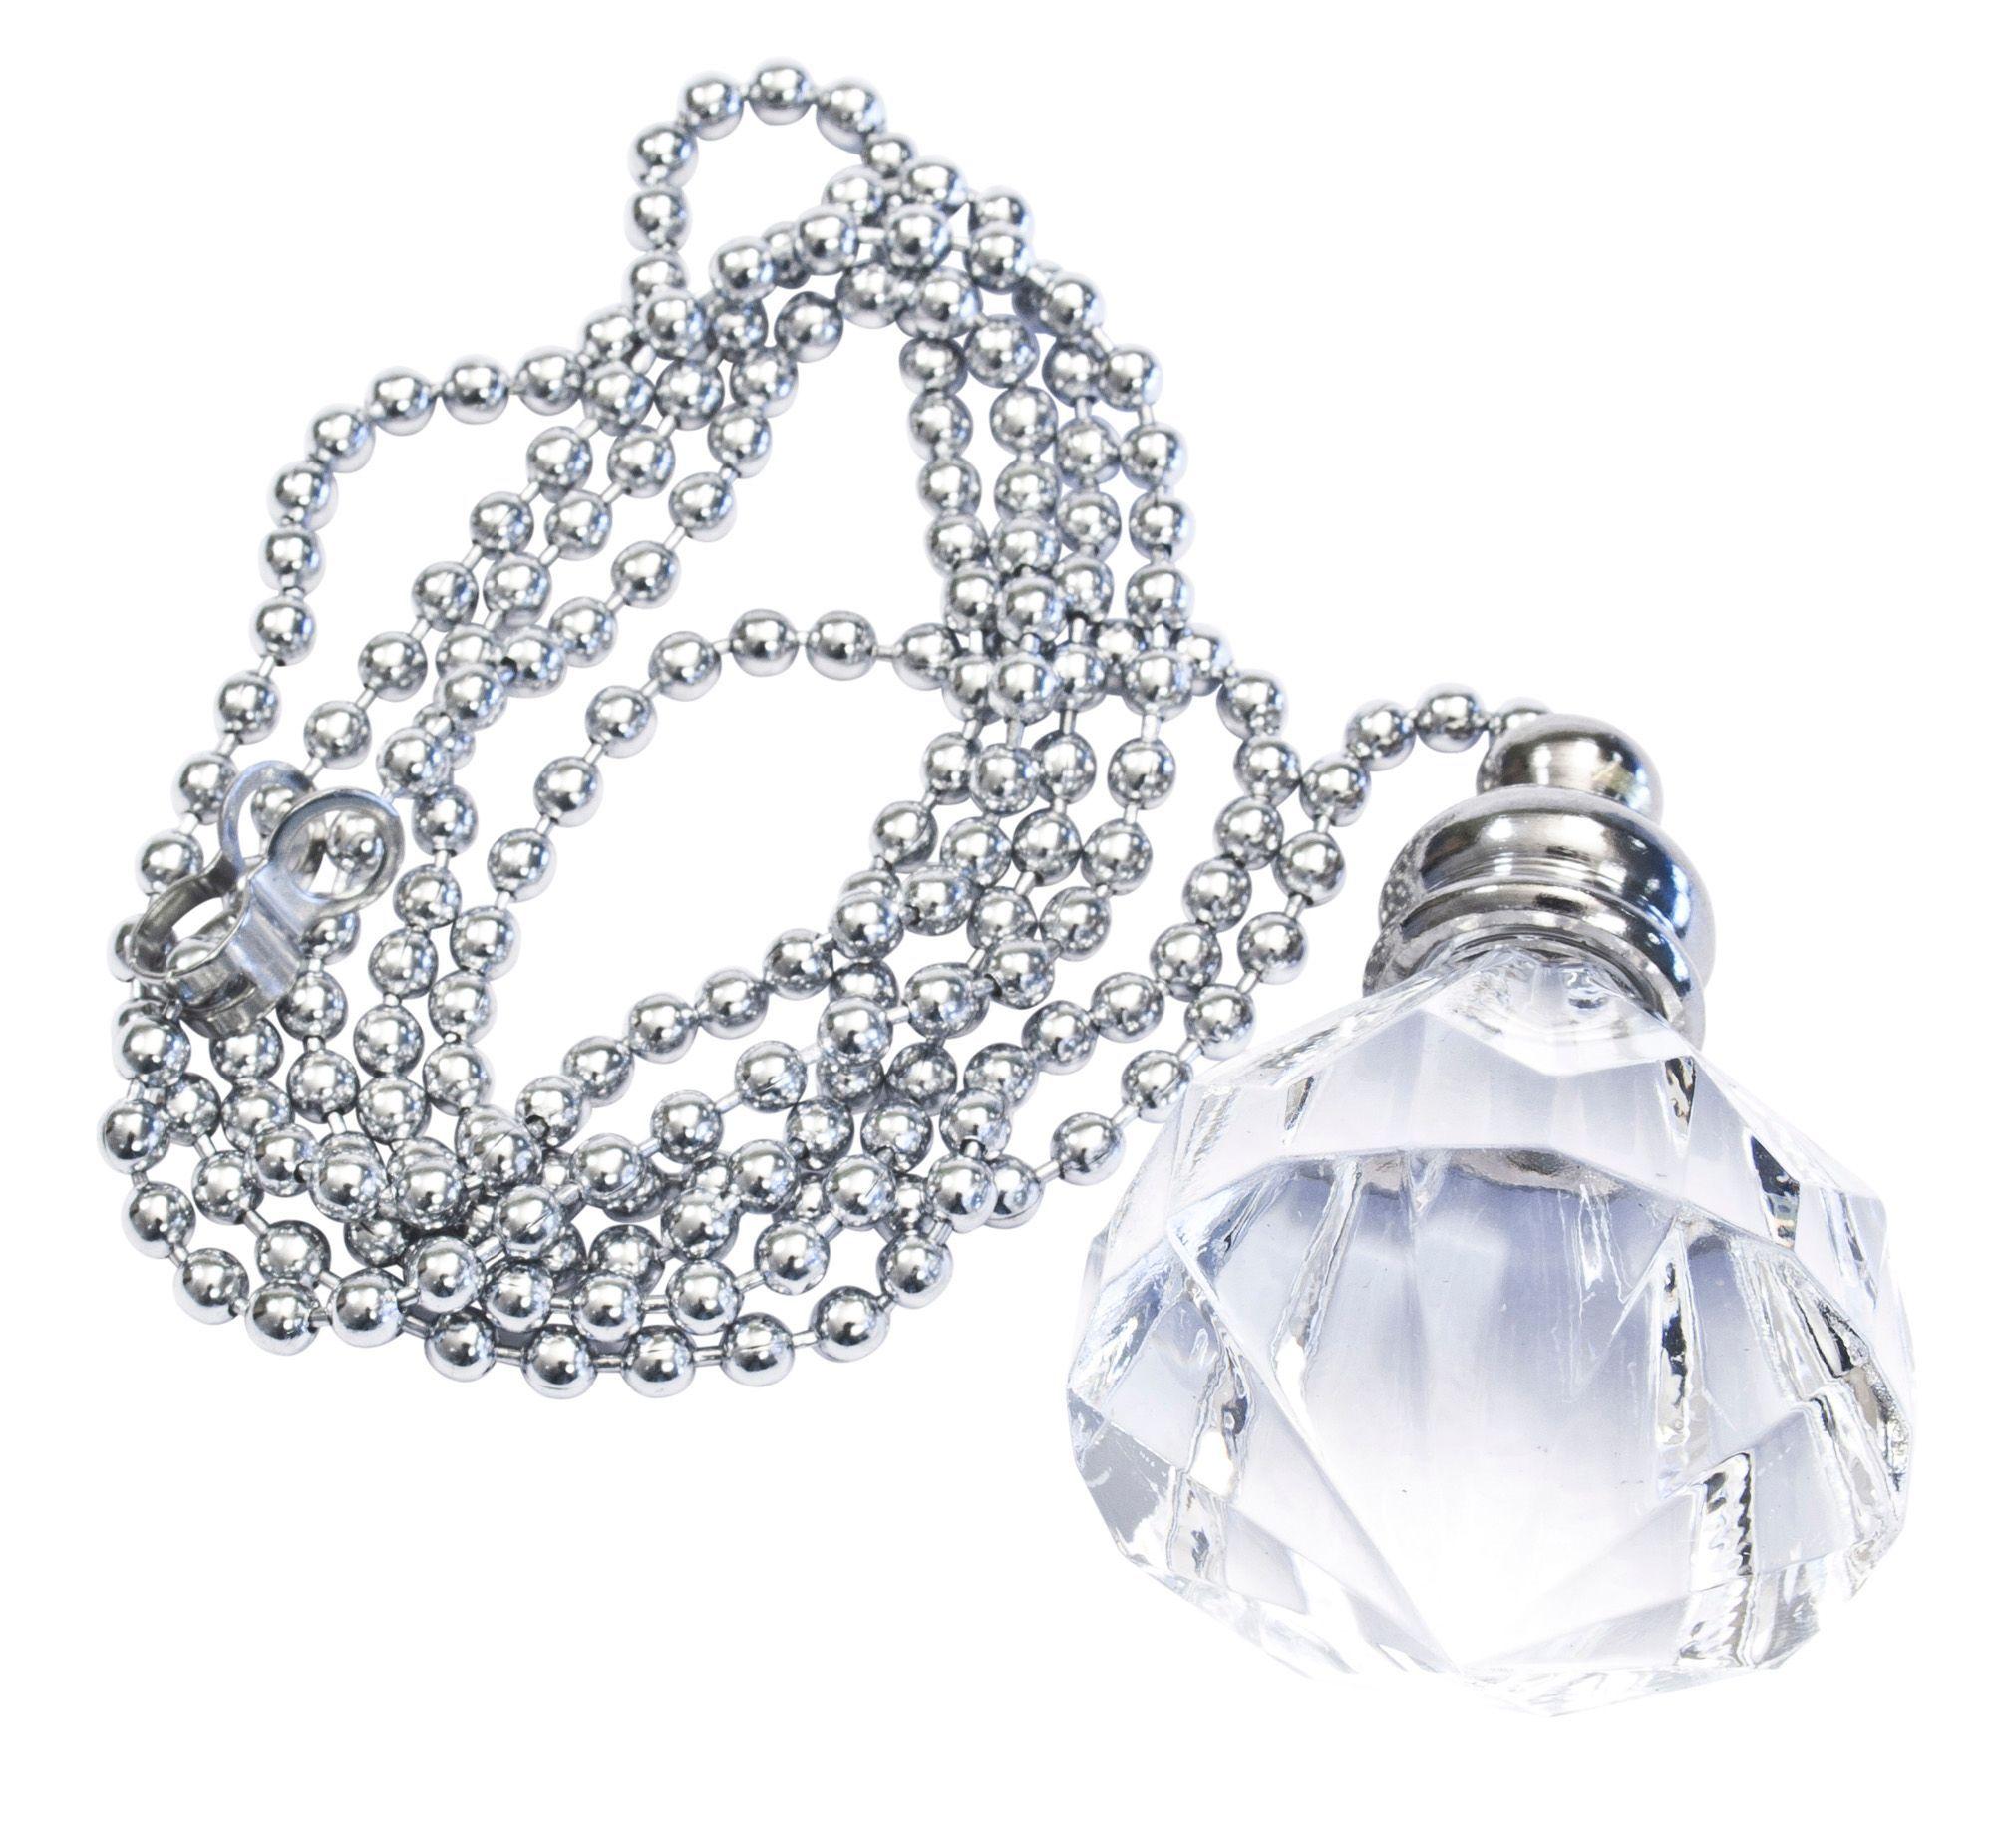 B&Q Silver Diamond Crystal Effect Acrylic Light Pull ...